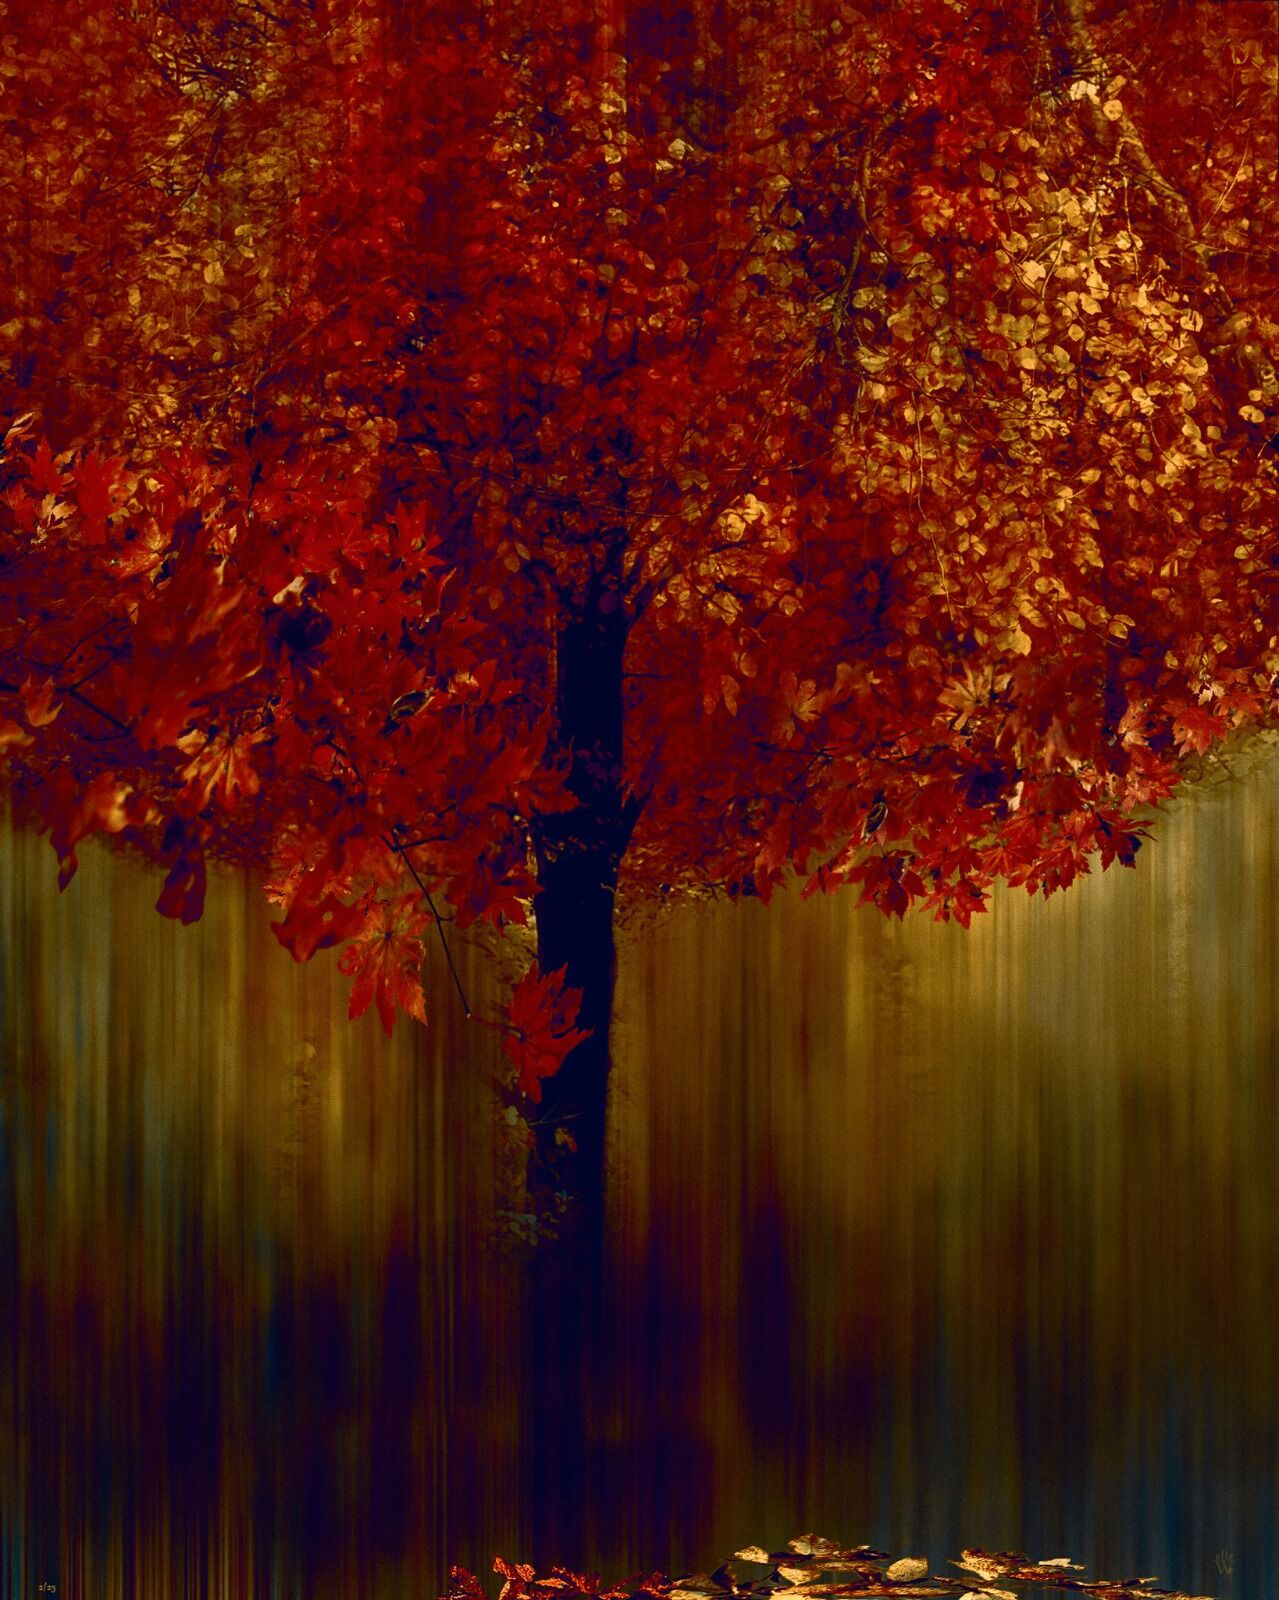 Autumnal Tree - Mixed Art Effect